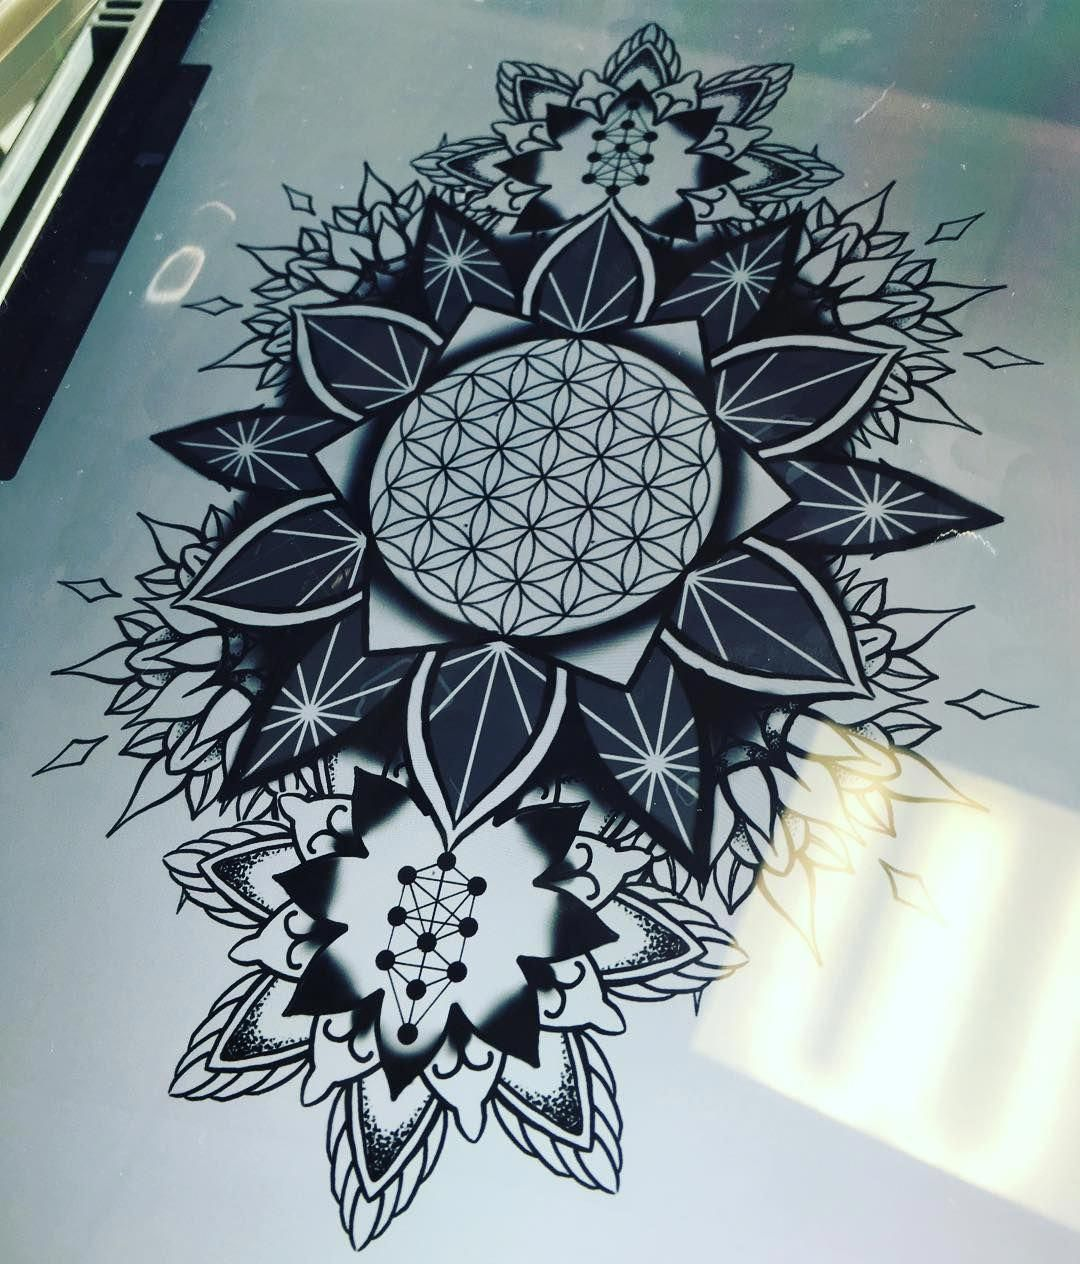 When Did Geometry Tattoos Start: Working On A Sacred Geometry Mandala Tattoo Design For